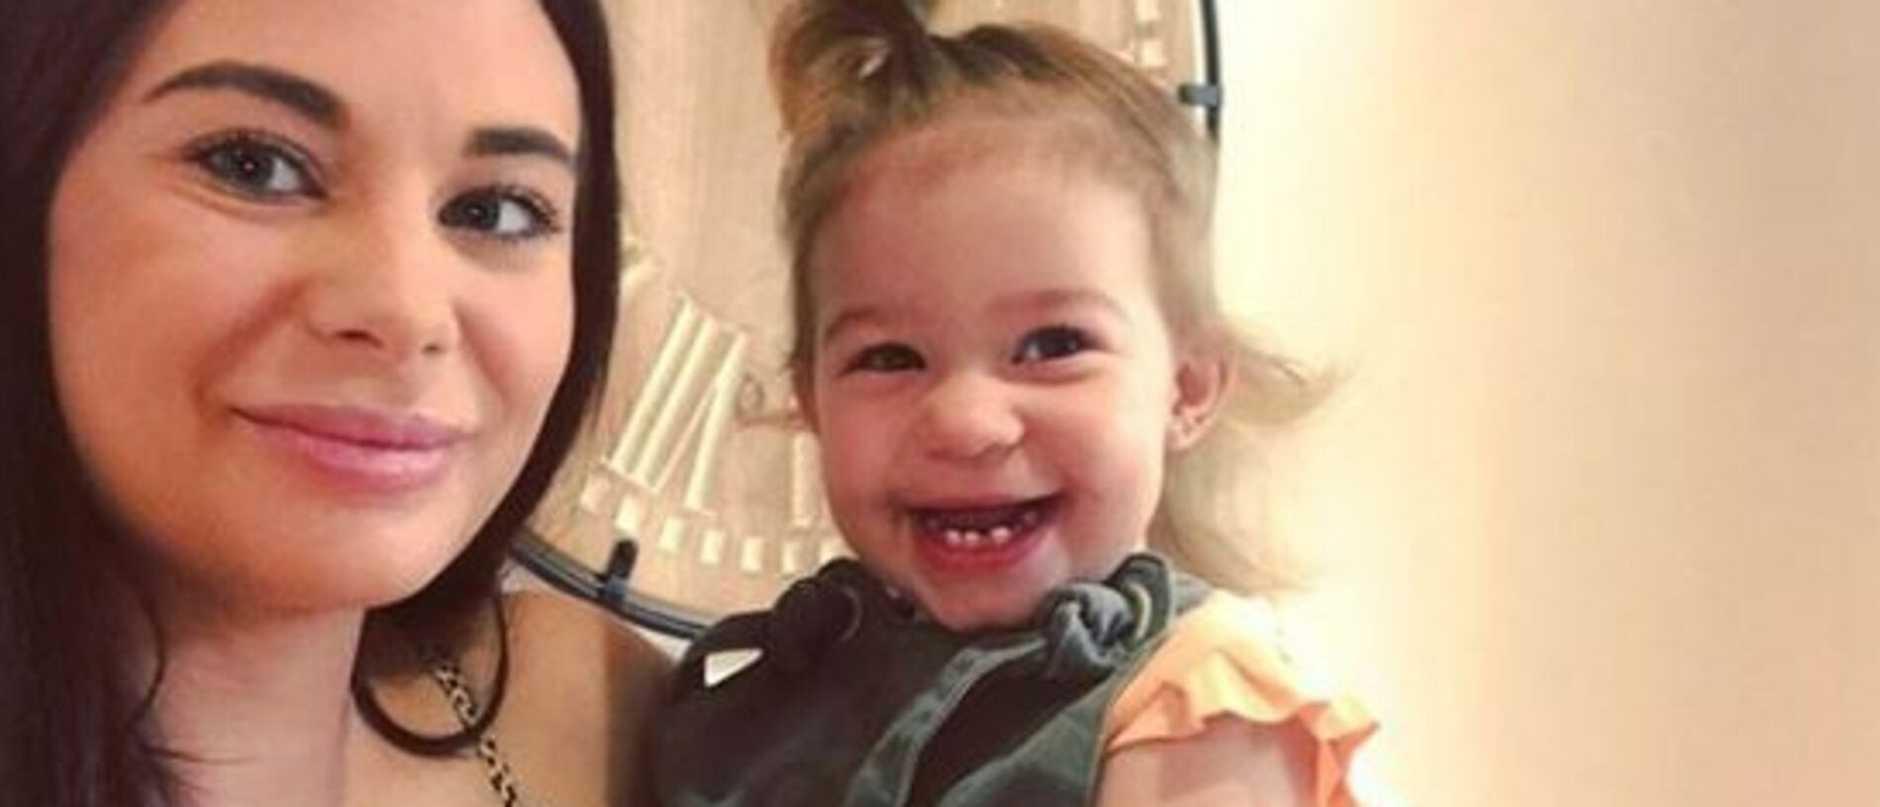 Georgina Manios with her baby Evie